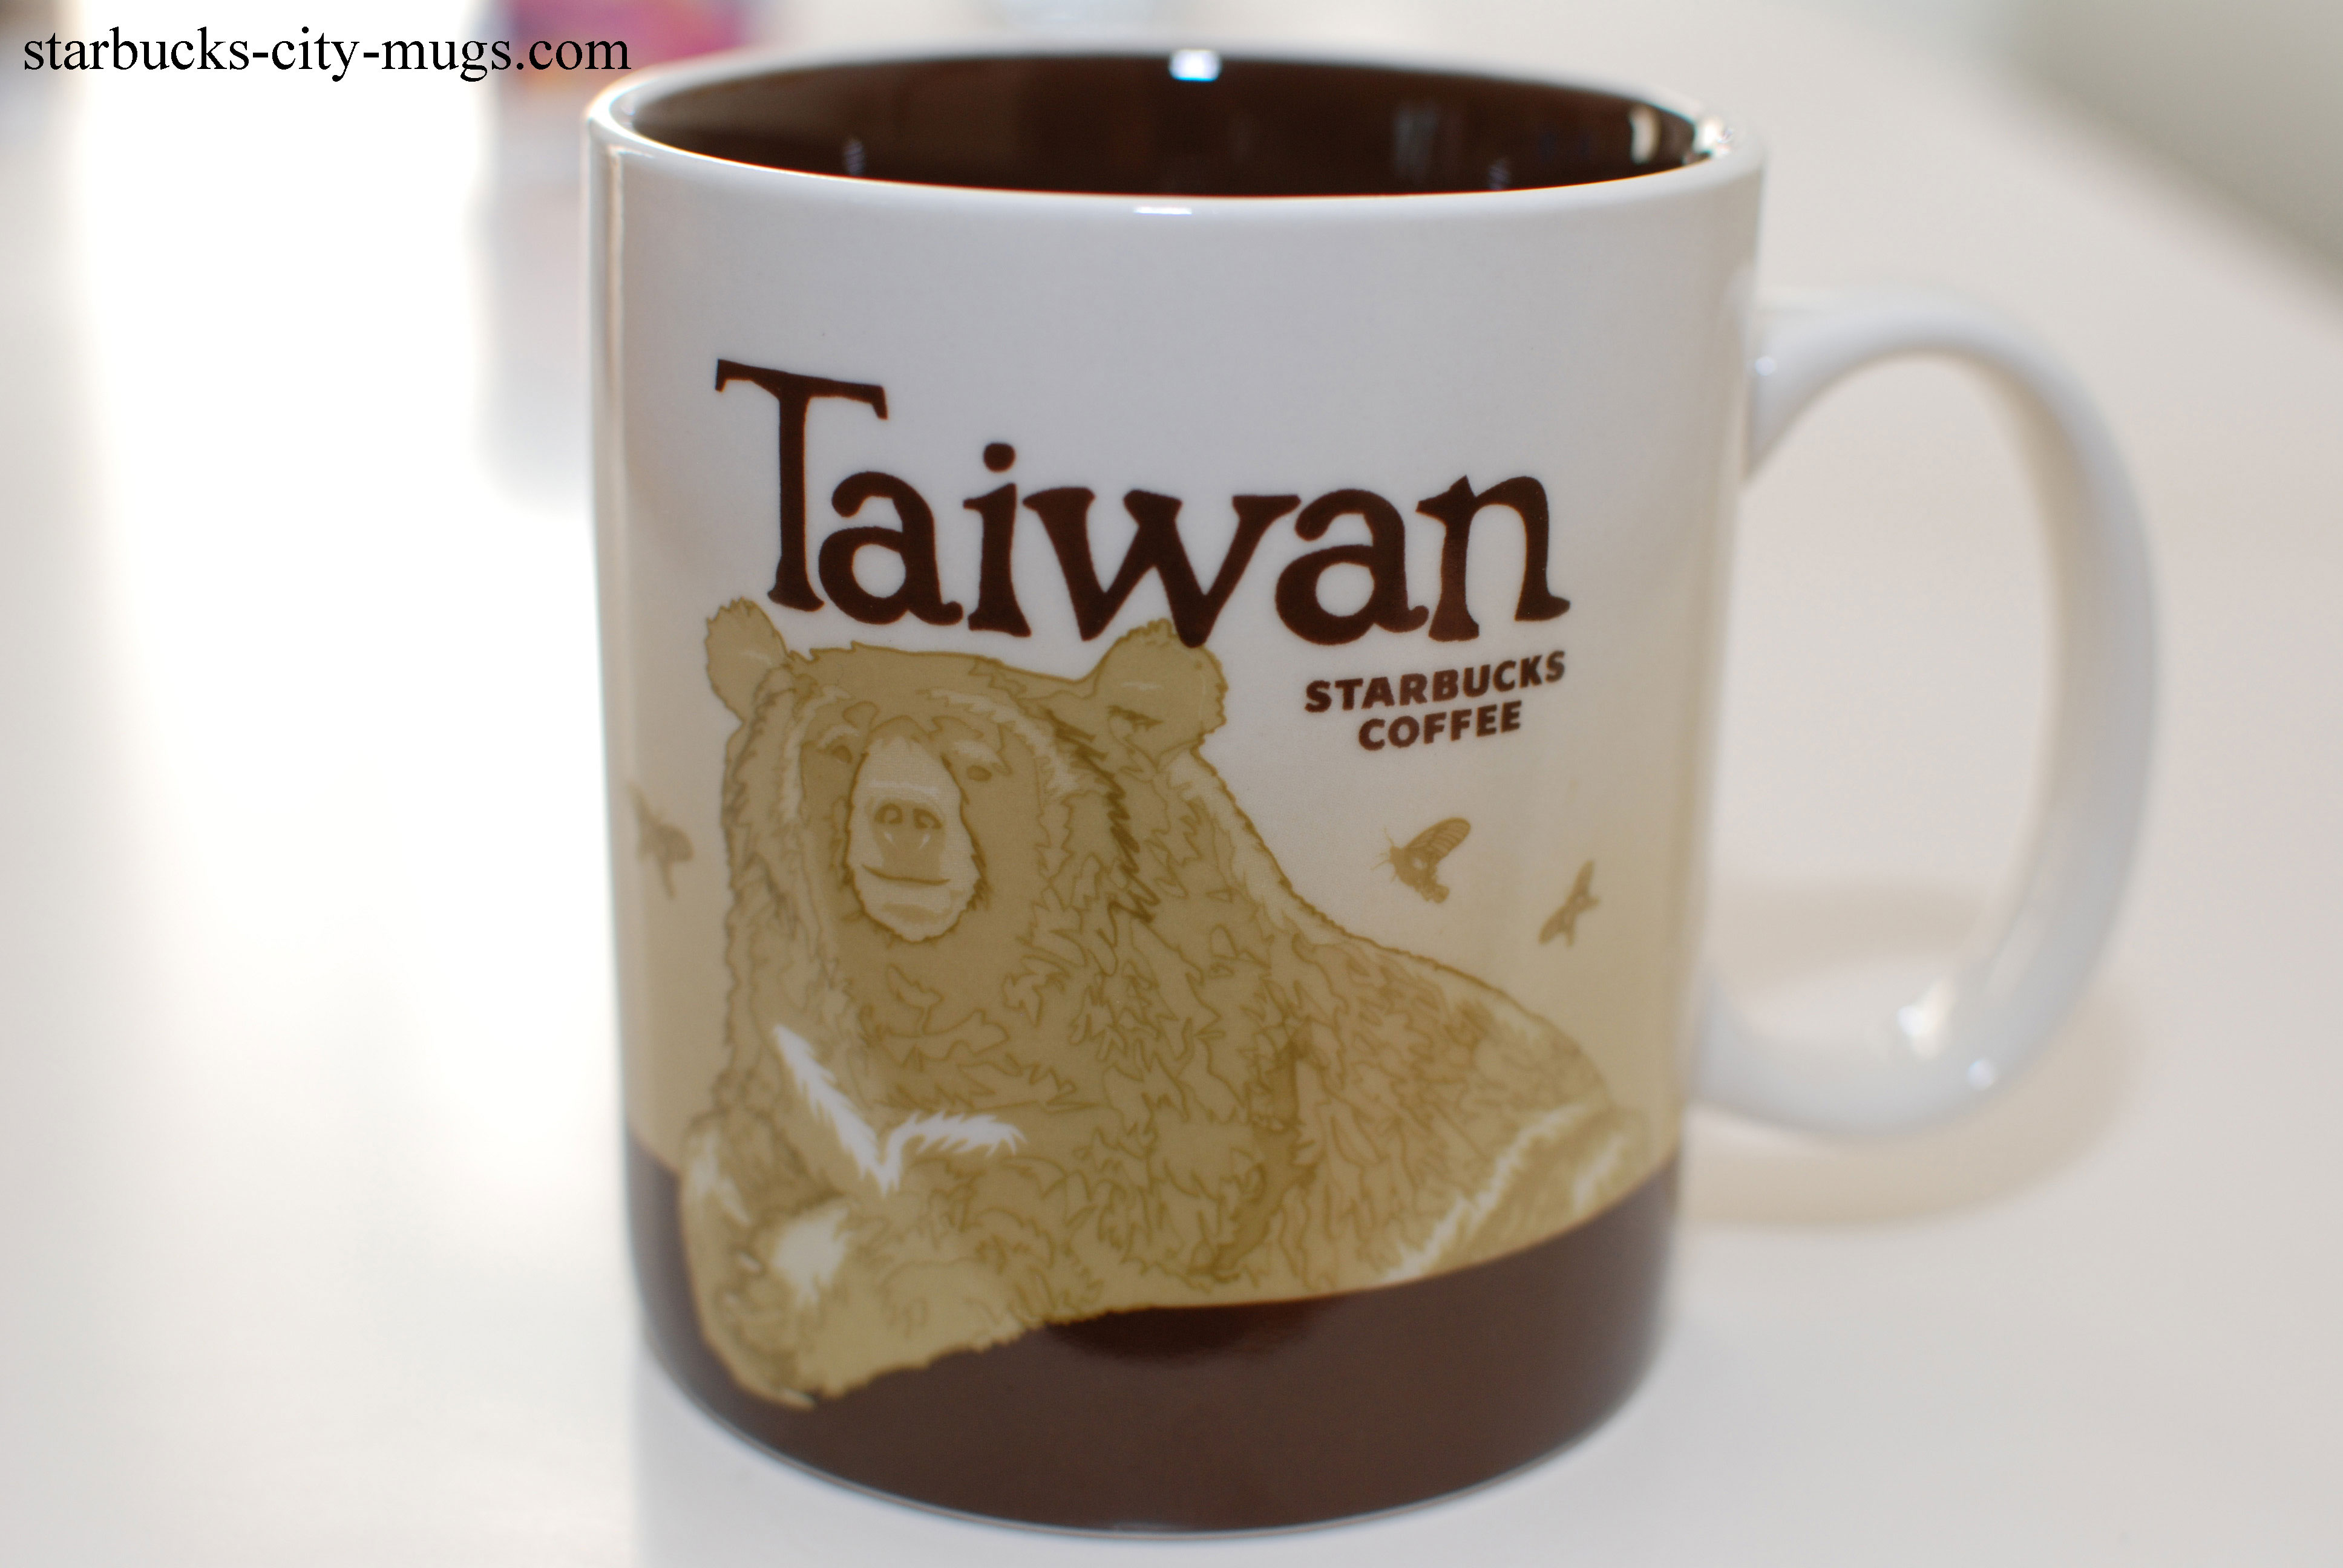 Taiwan Icons Starbucks City Mugs